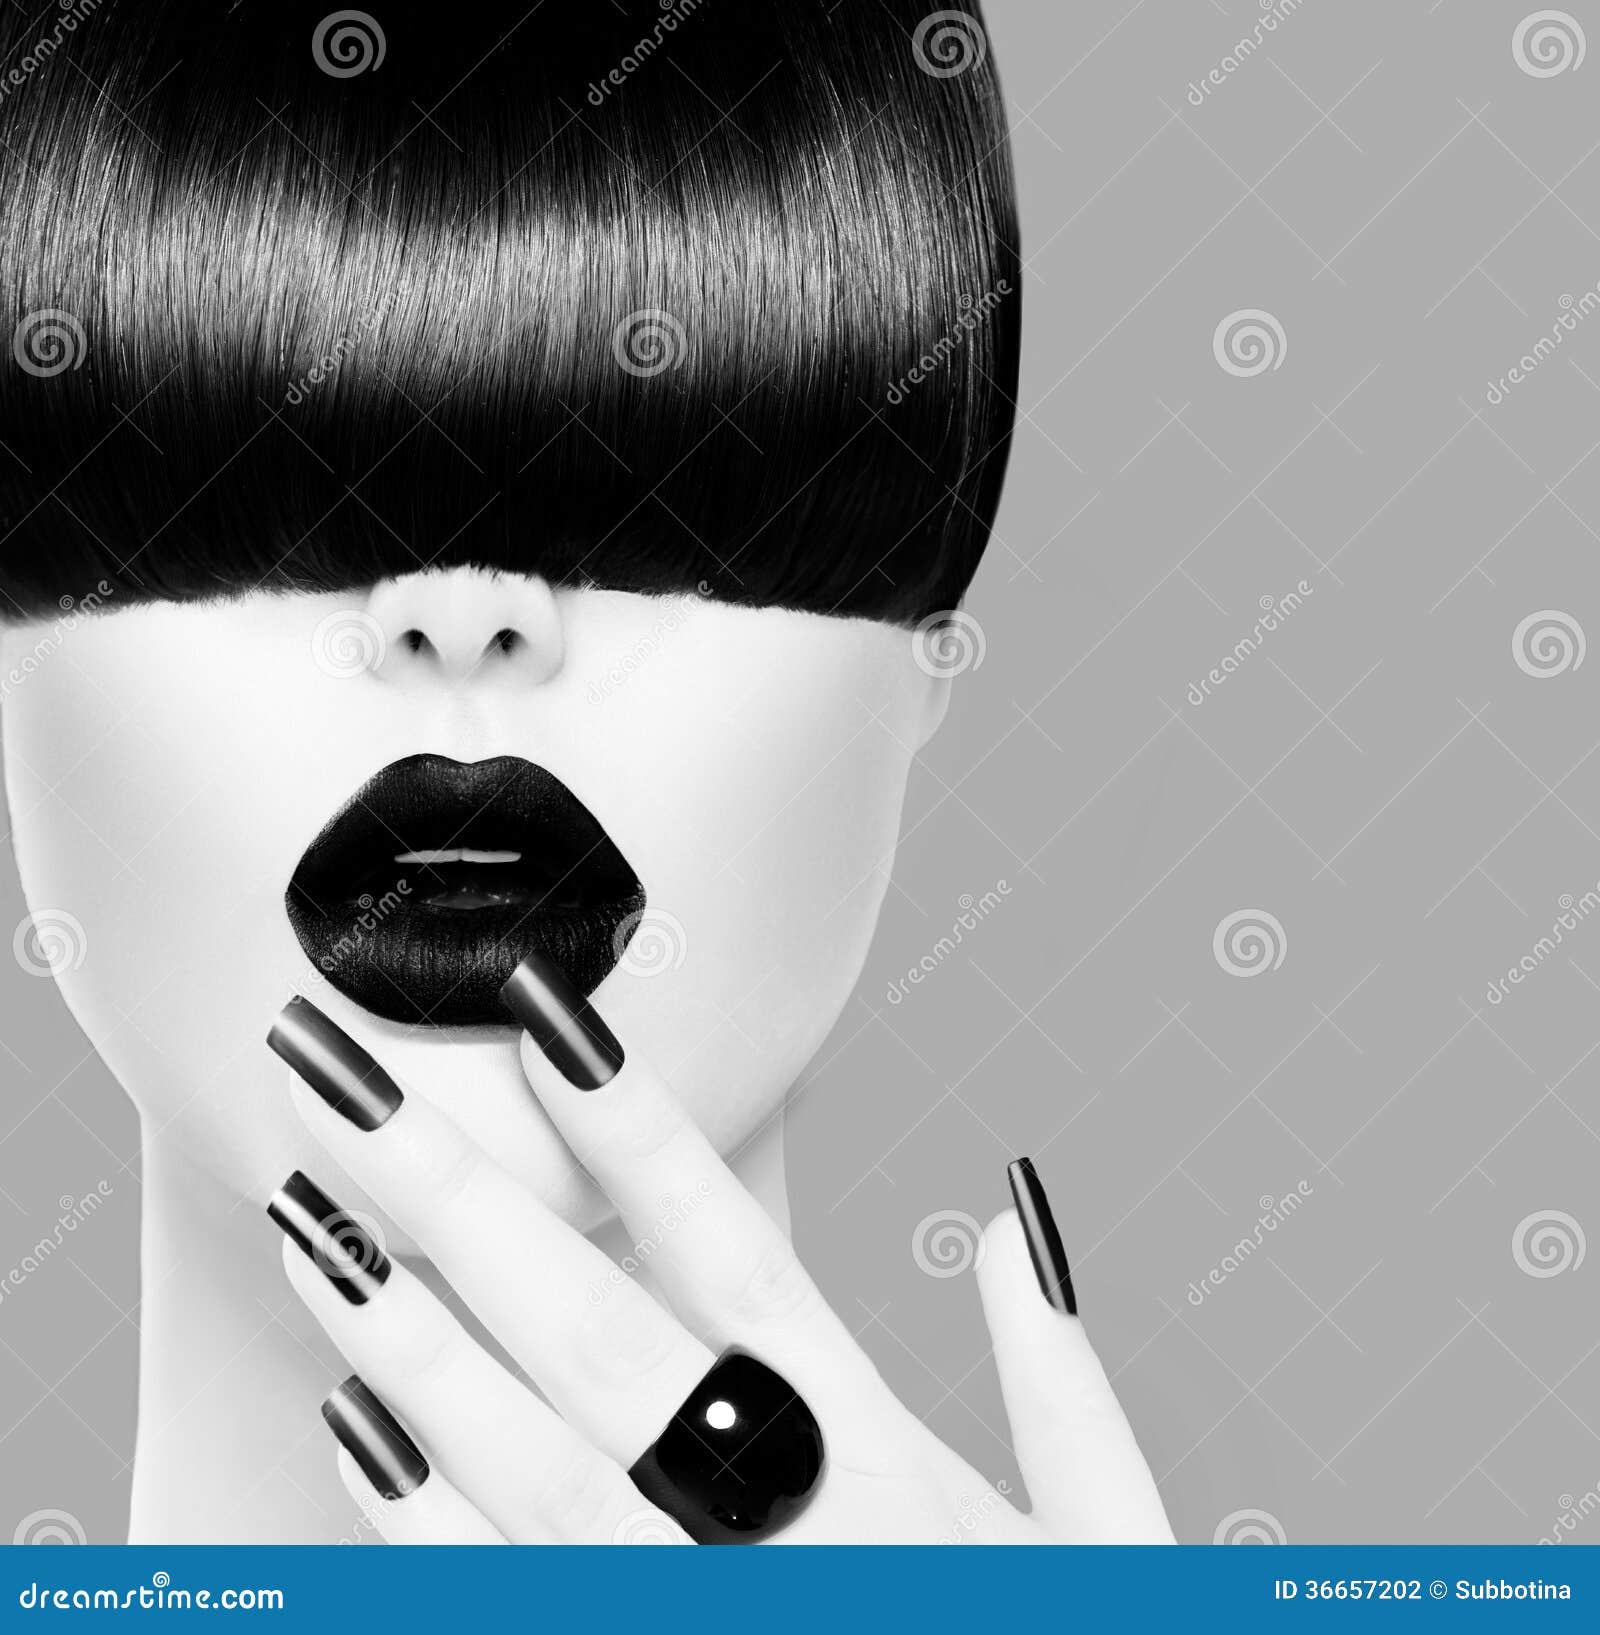 high fashion model girl portrait stock photography image. Black Bedroom Furniture Sets. Home Design Ideas